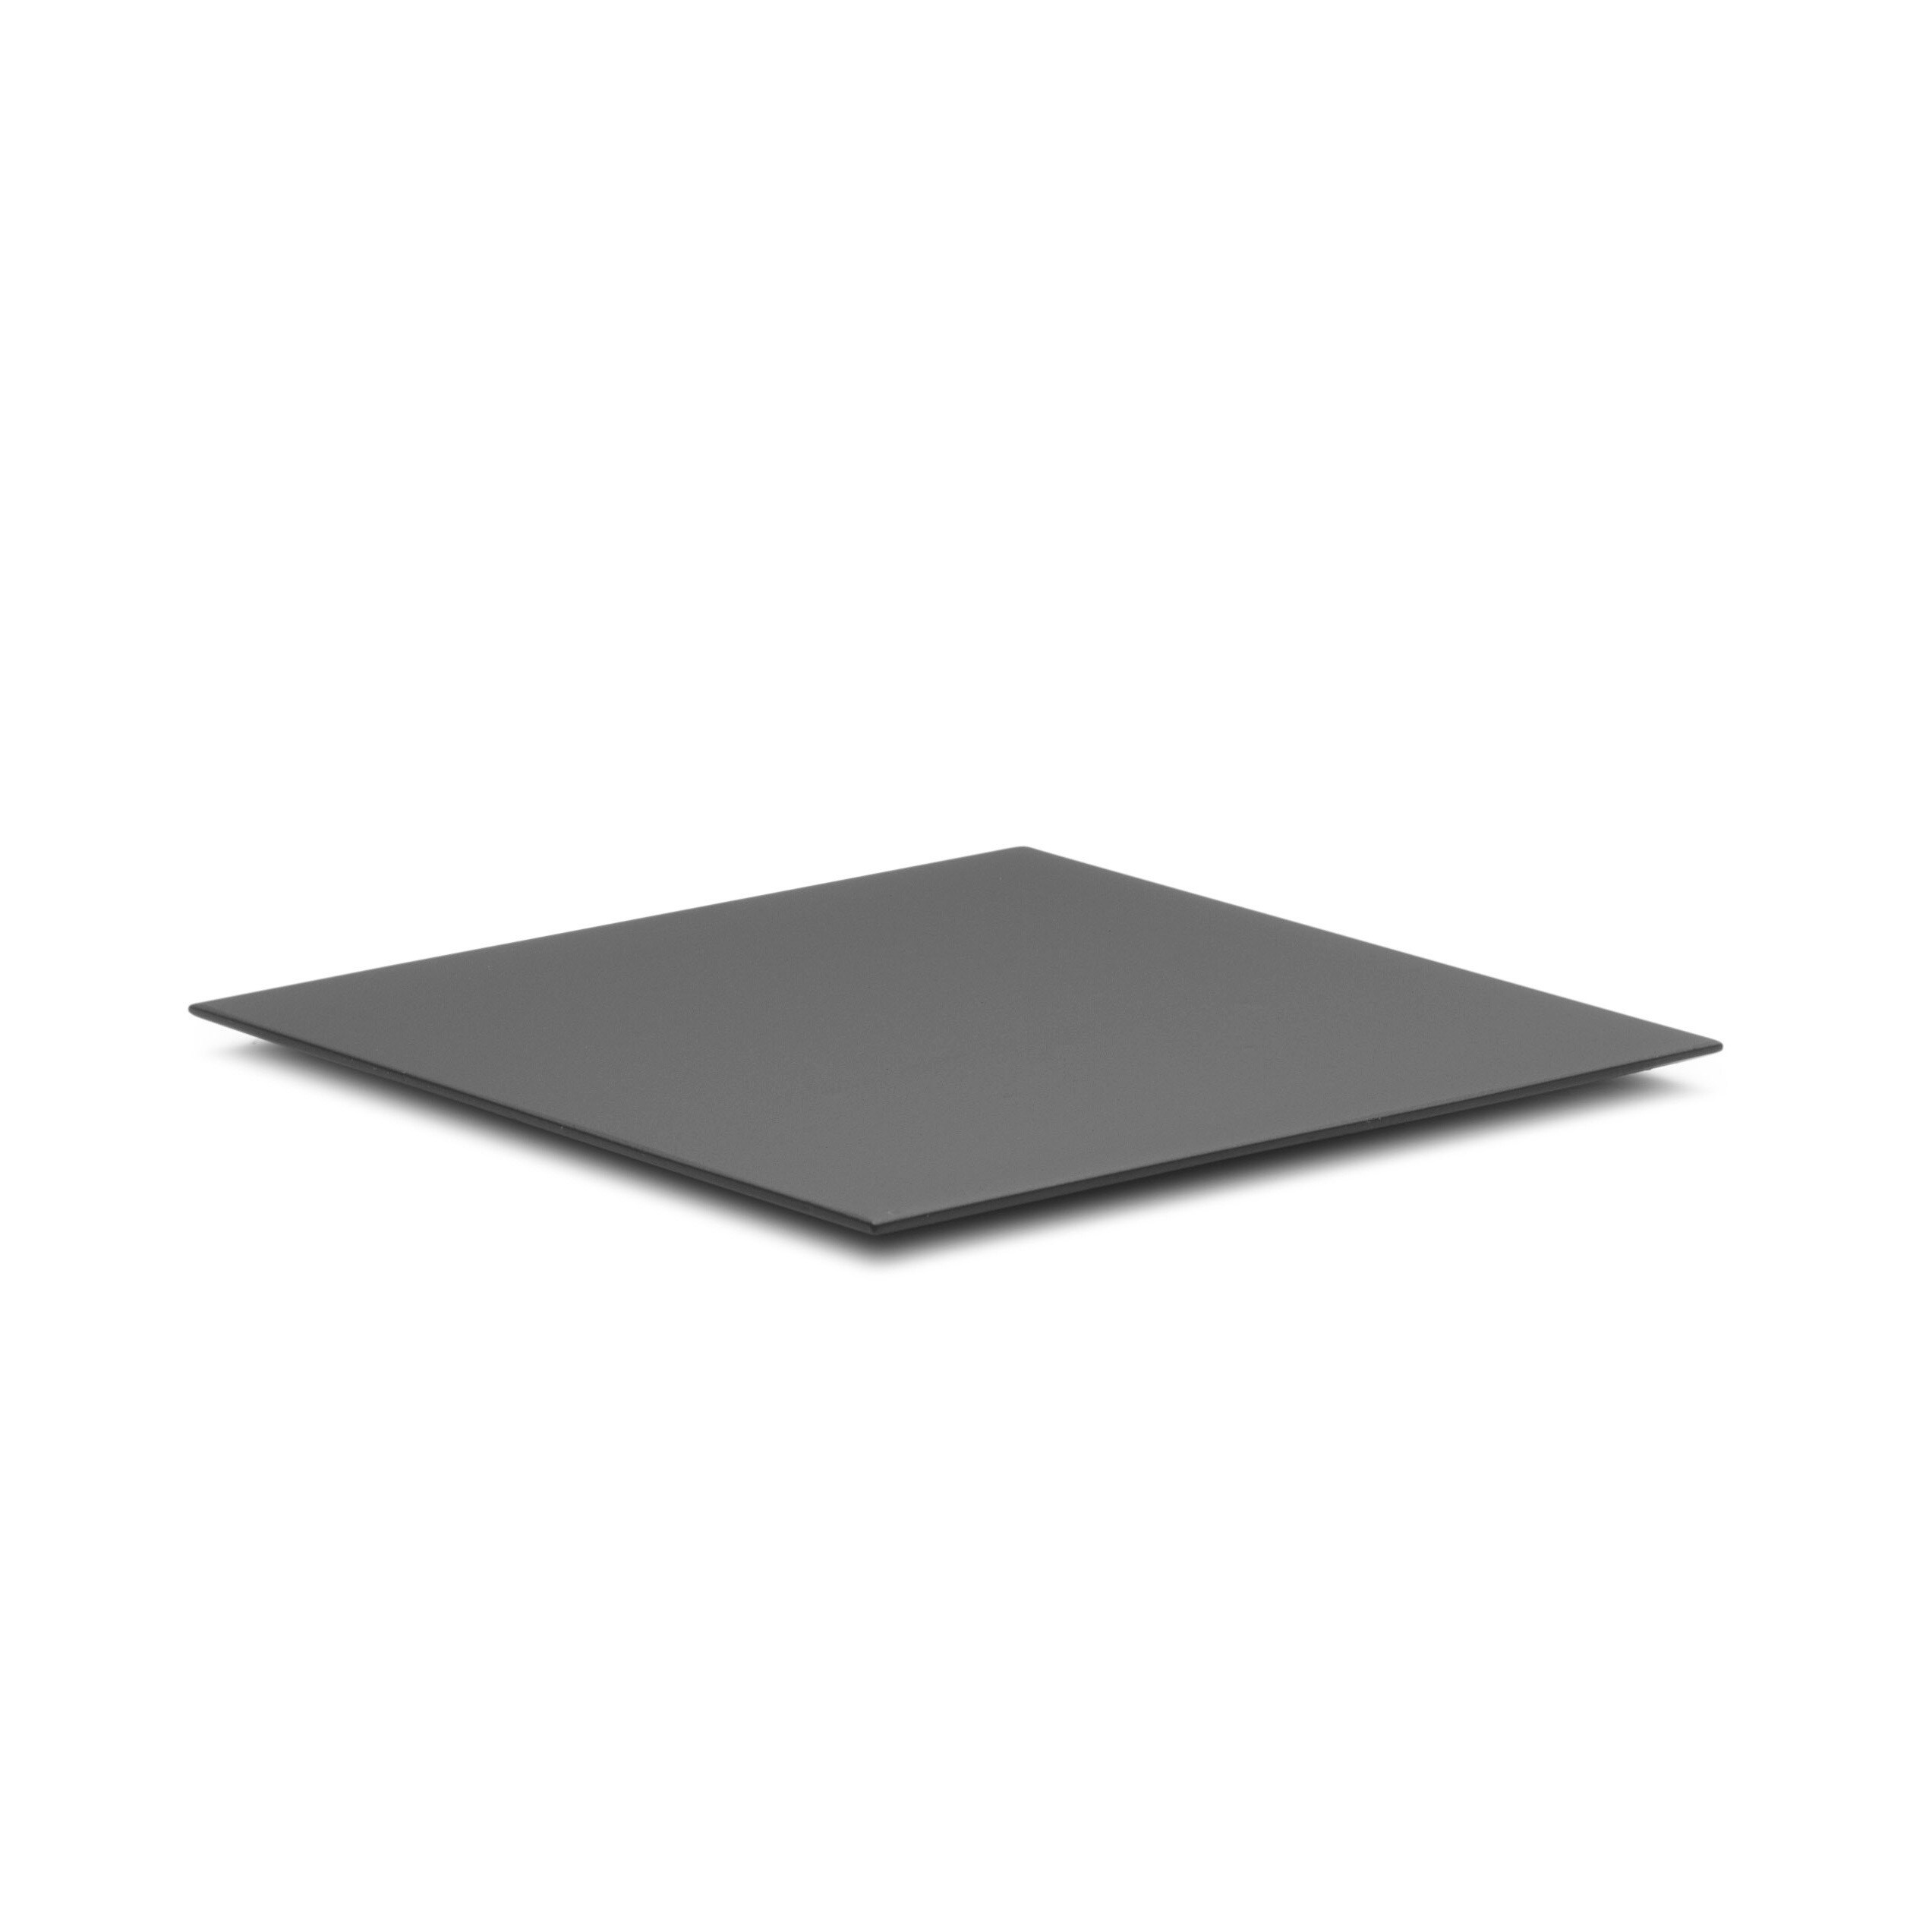 Base kubus 4 svart